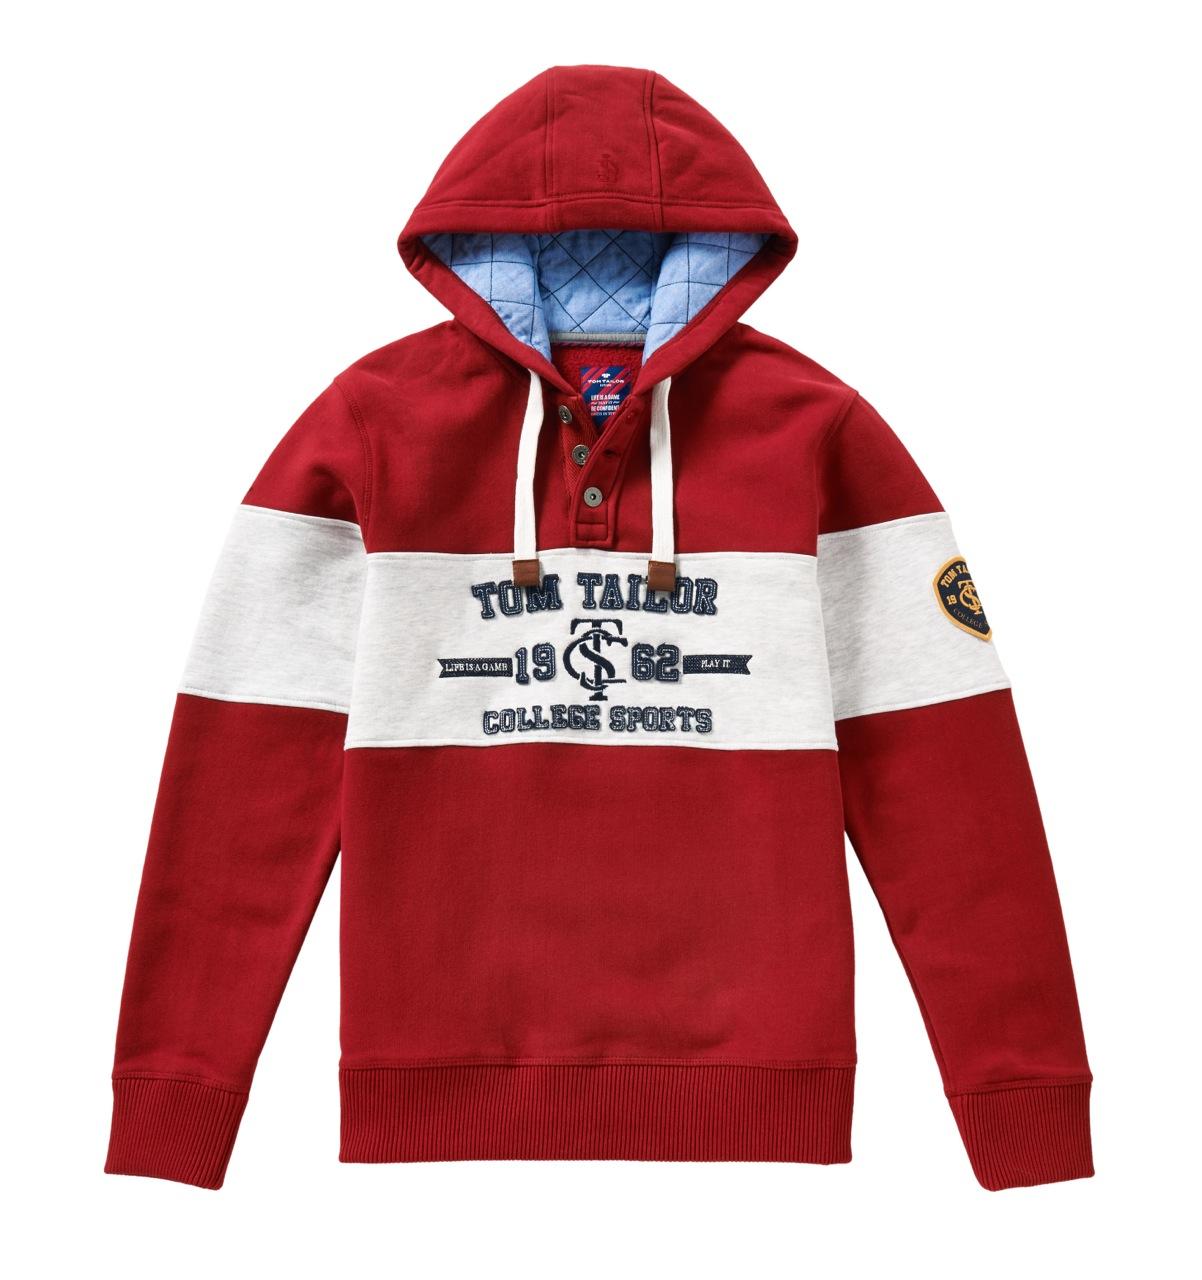 fstt04.06f-tom-tailor-hoodie-h-w-14-15